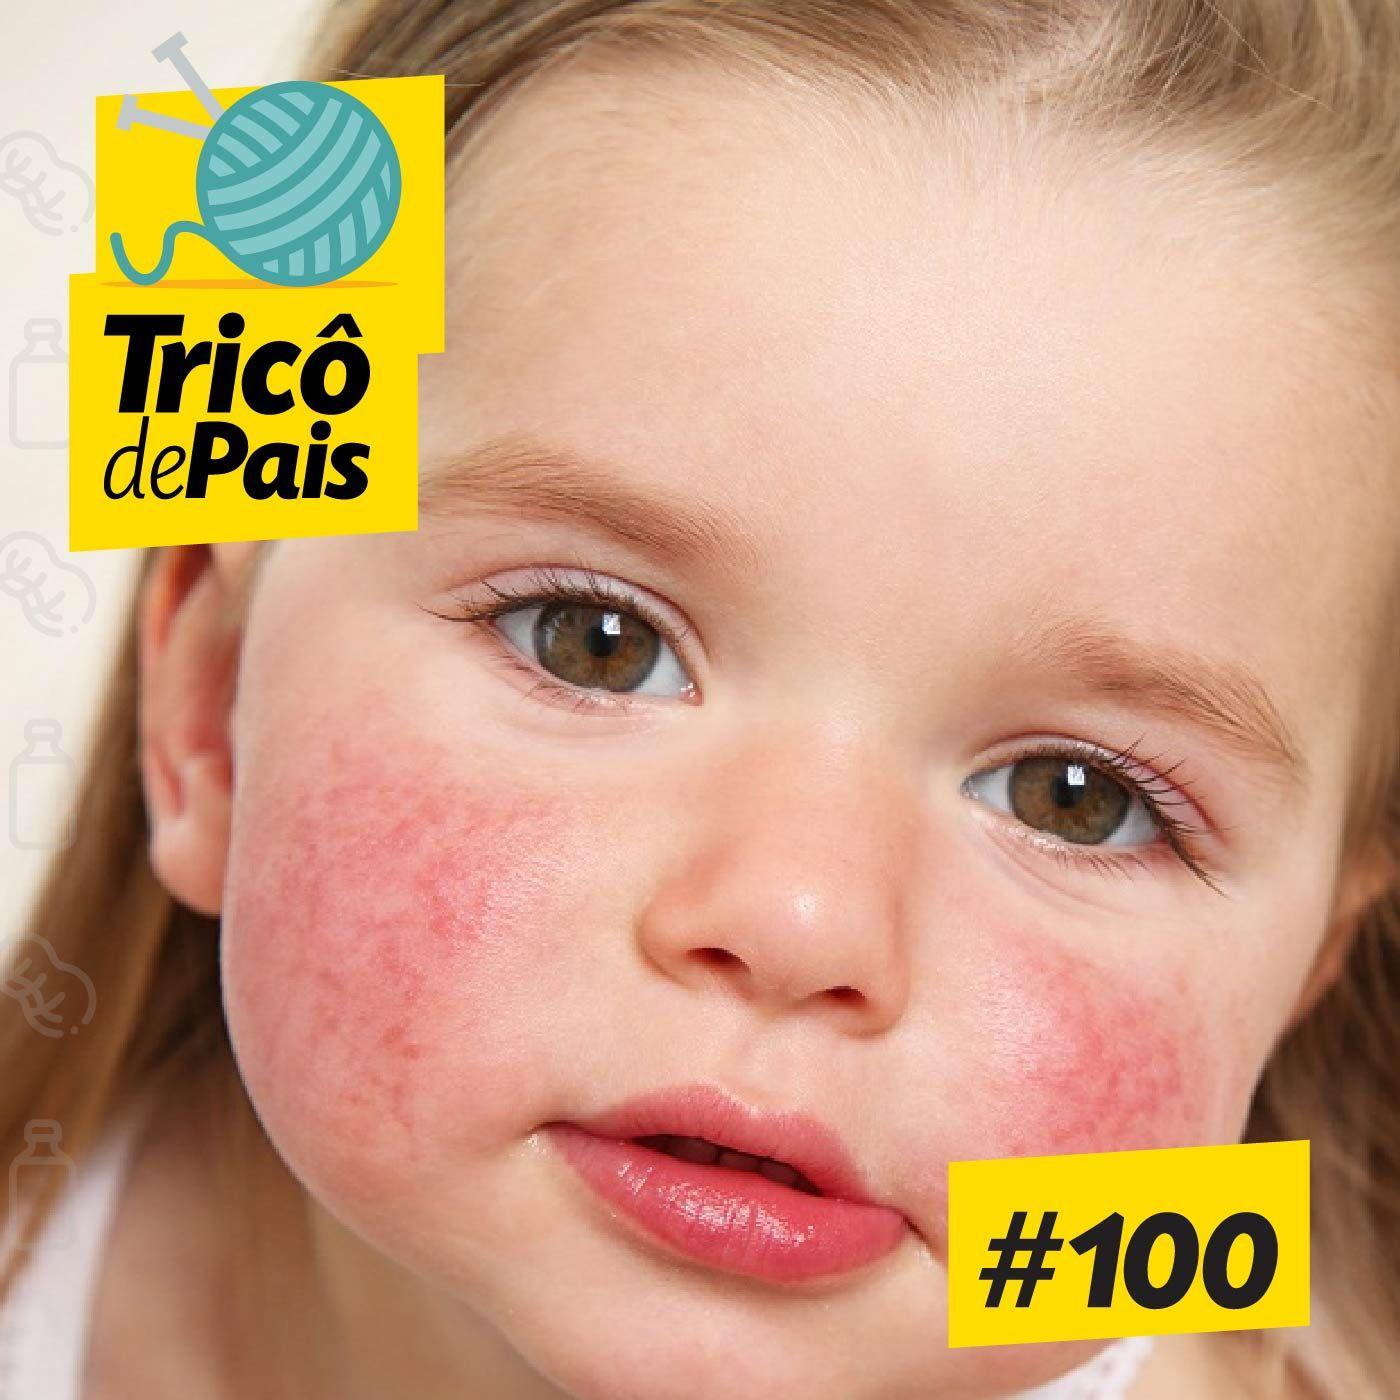 #100 - É Alergia ou Frescura? feat. Laura Gomes e Marko Mello